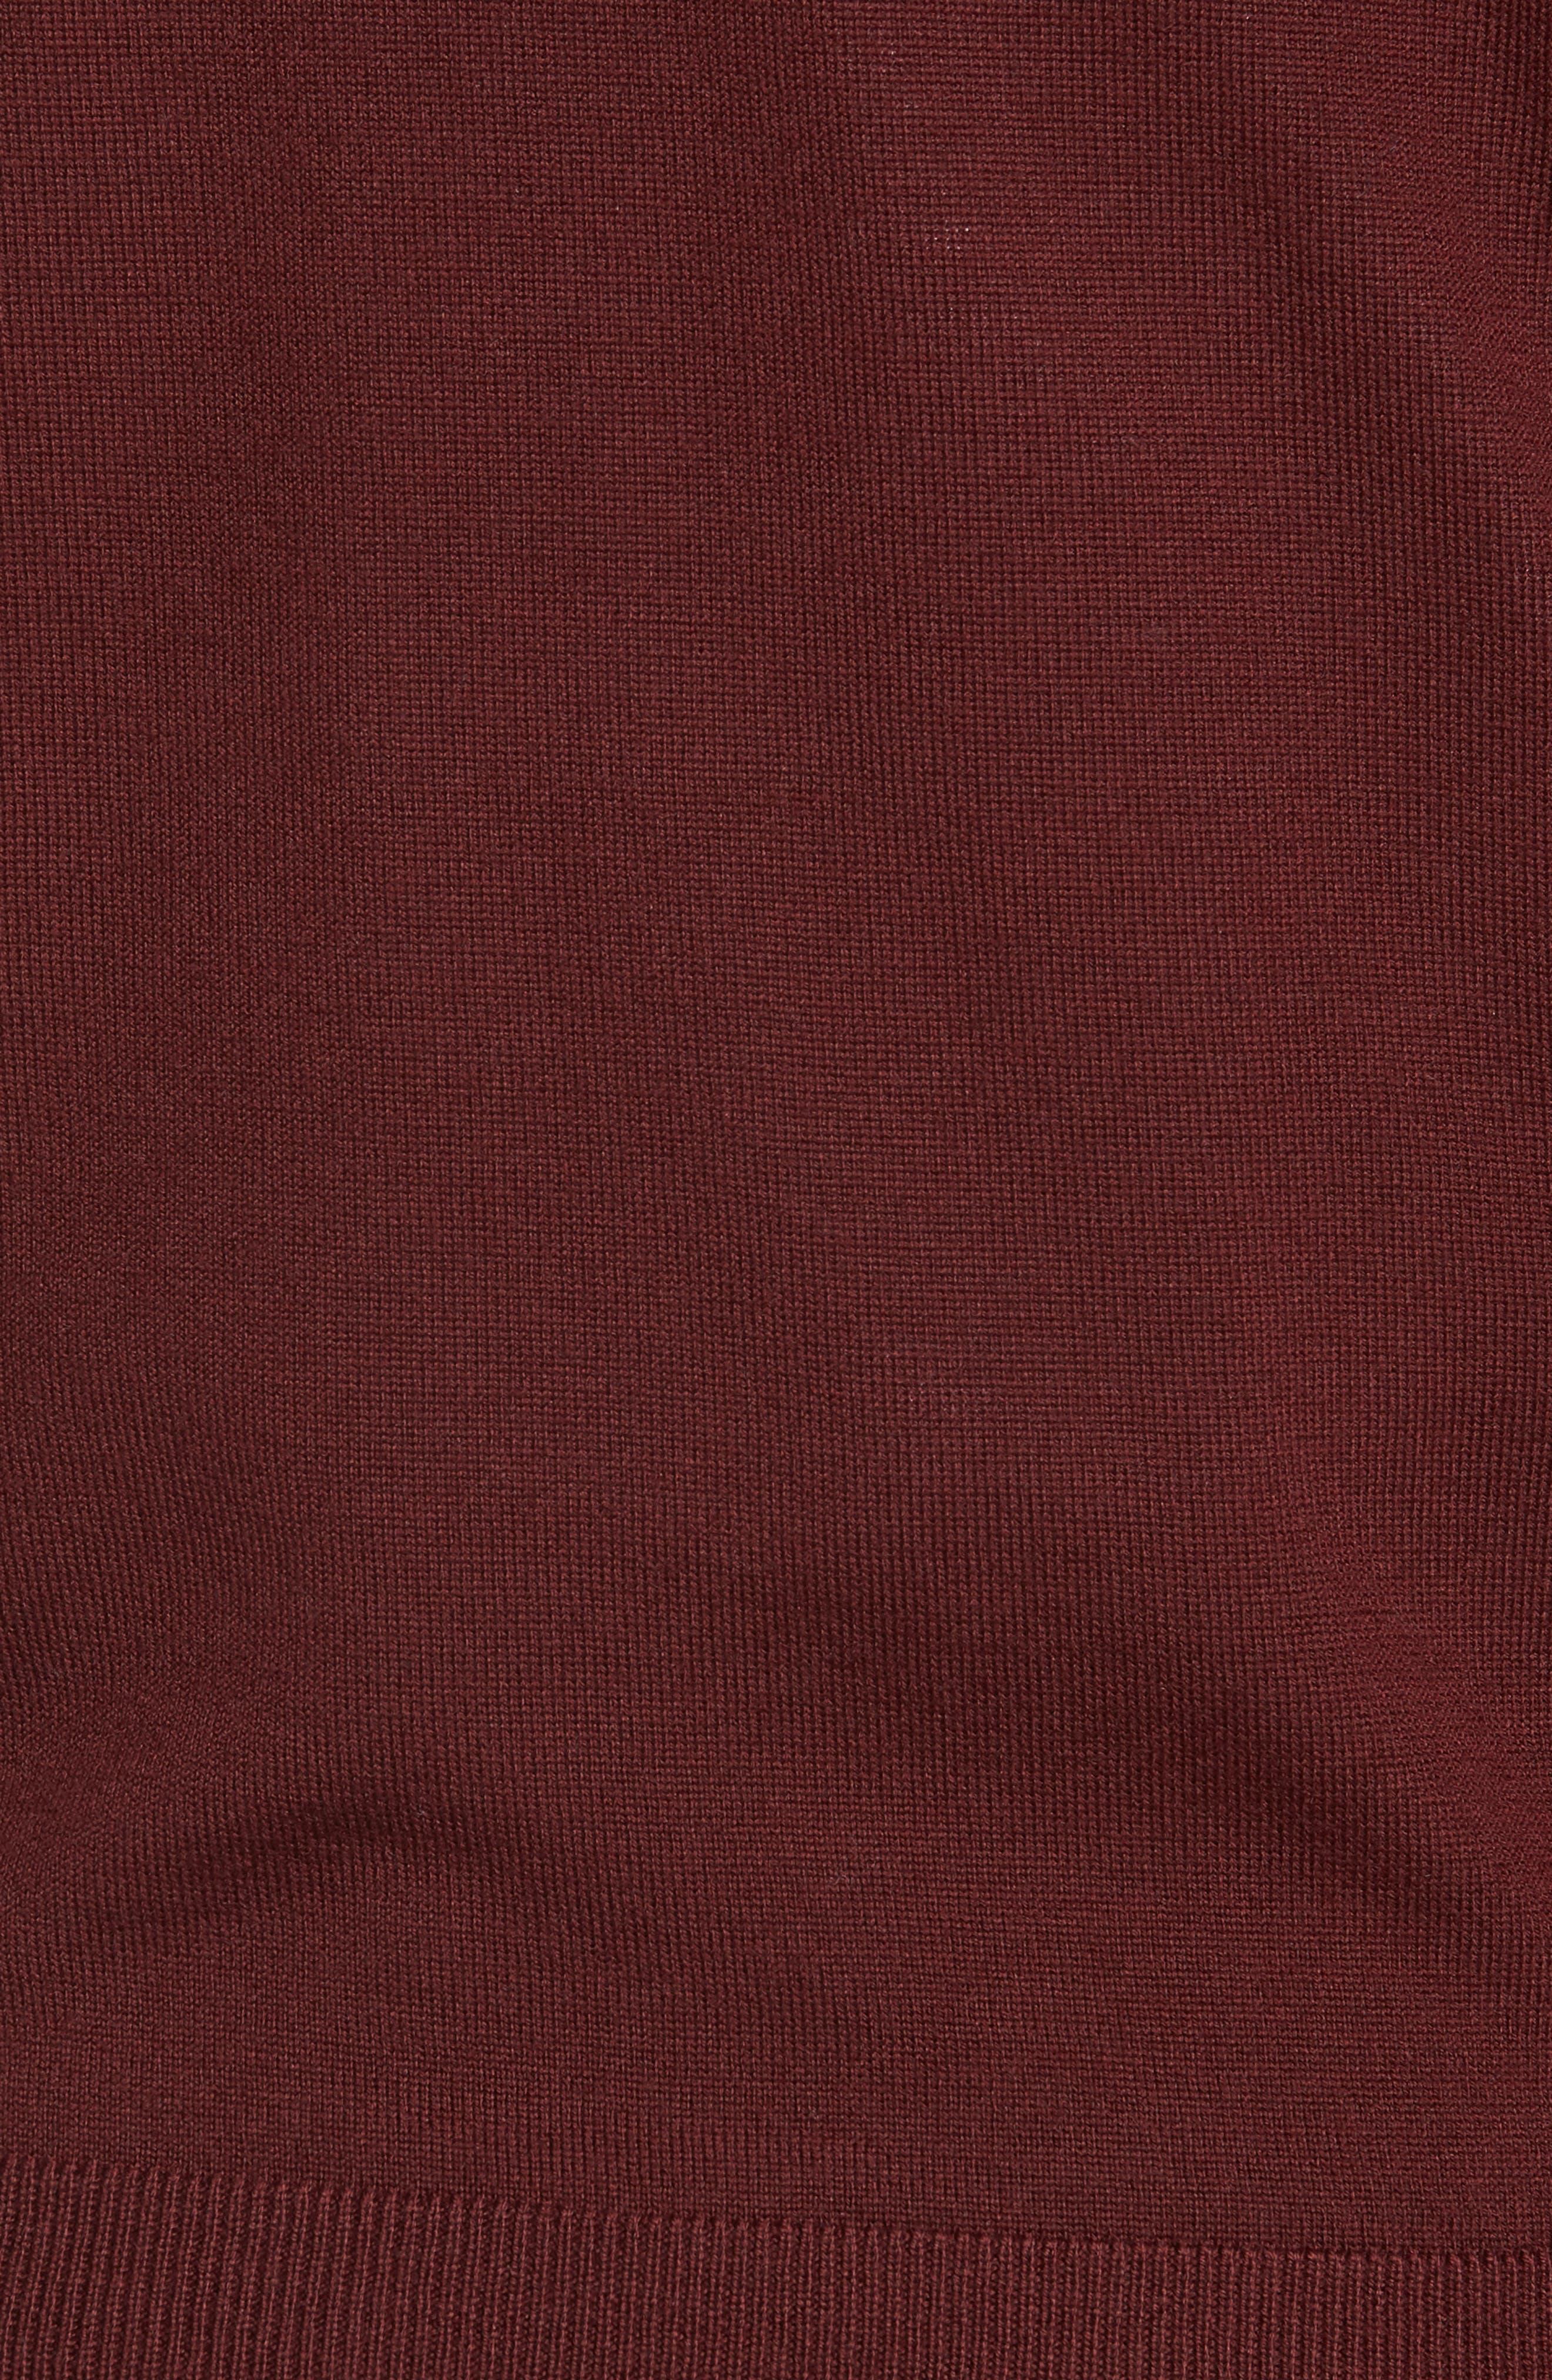 Quarter Zip Wool Pullover,                             Alternate thumbnail 5, color,                             BURGUNDY ROYALE